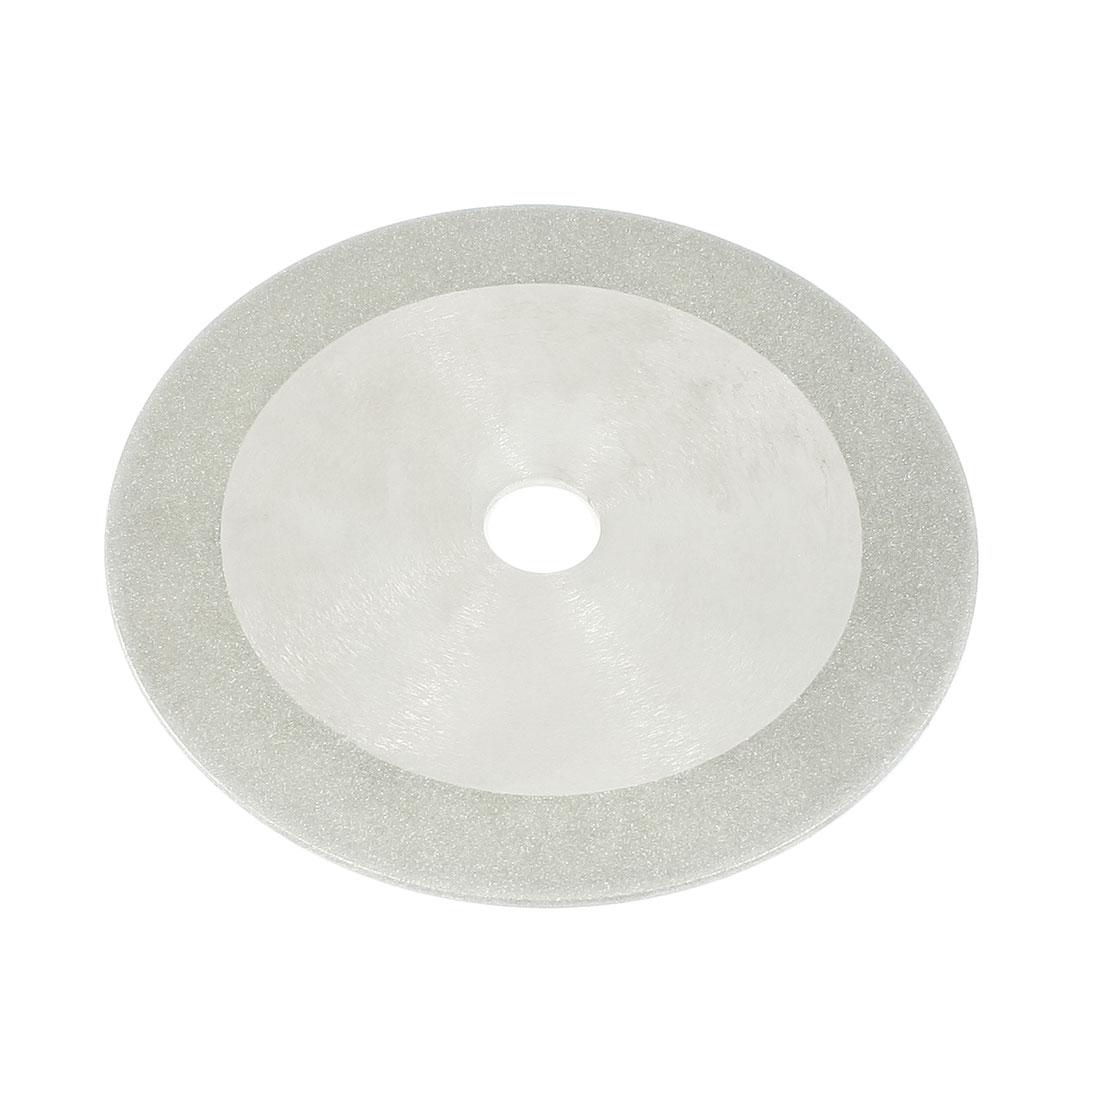 150mm x 20mm Aluminum Resin Bond Diamond Coated Grinding Wheel Silver Tone